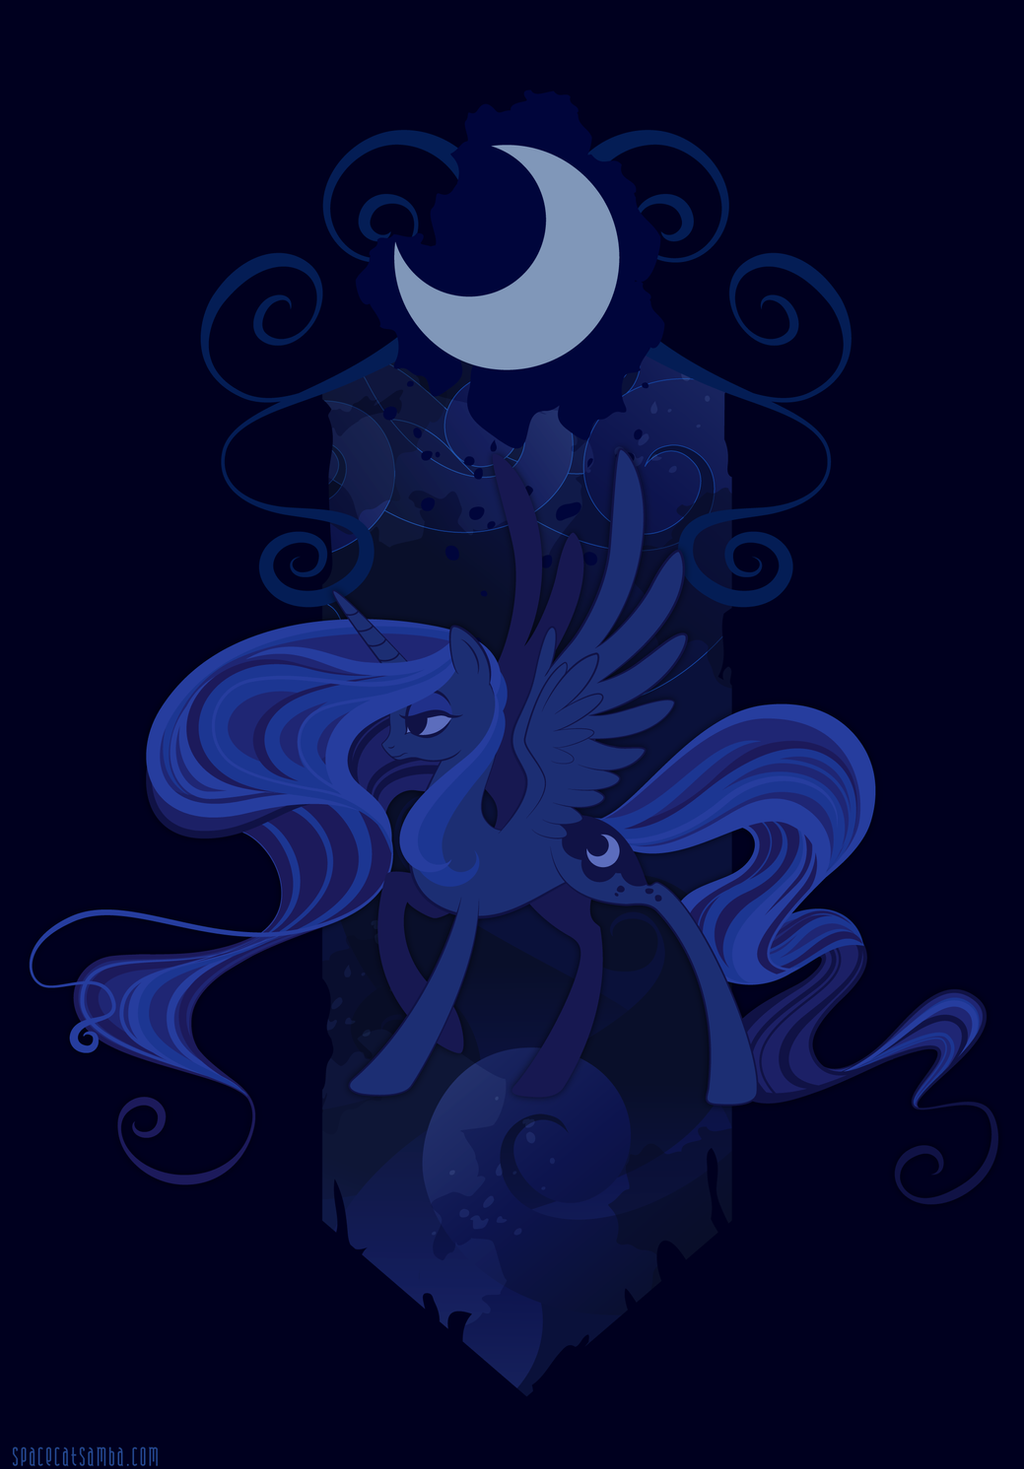 Lunar Tapestry by SpaceKitty